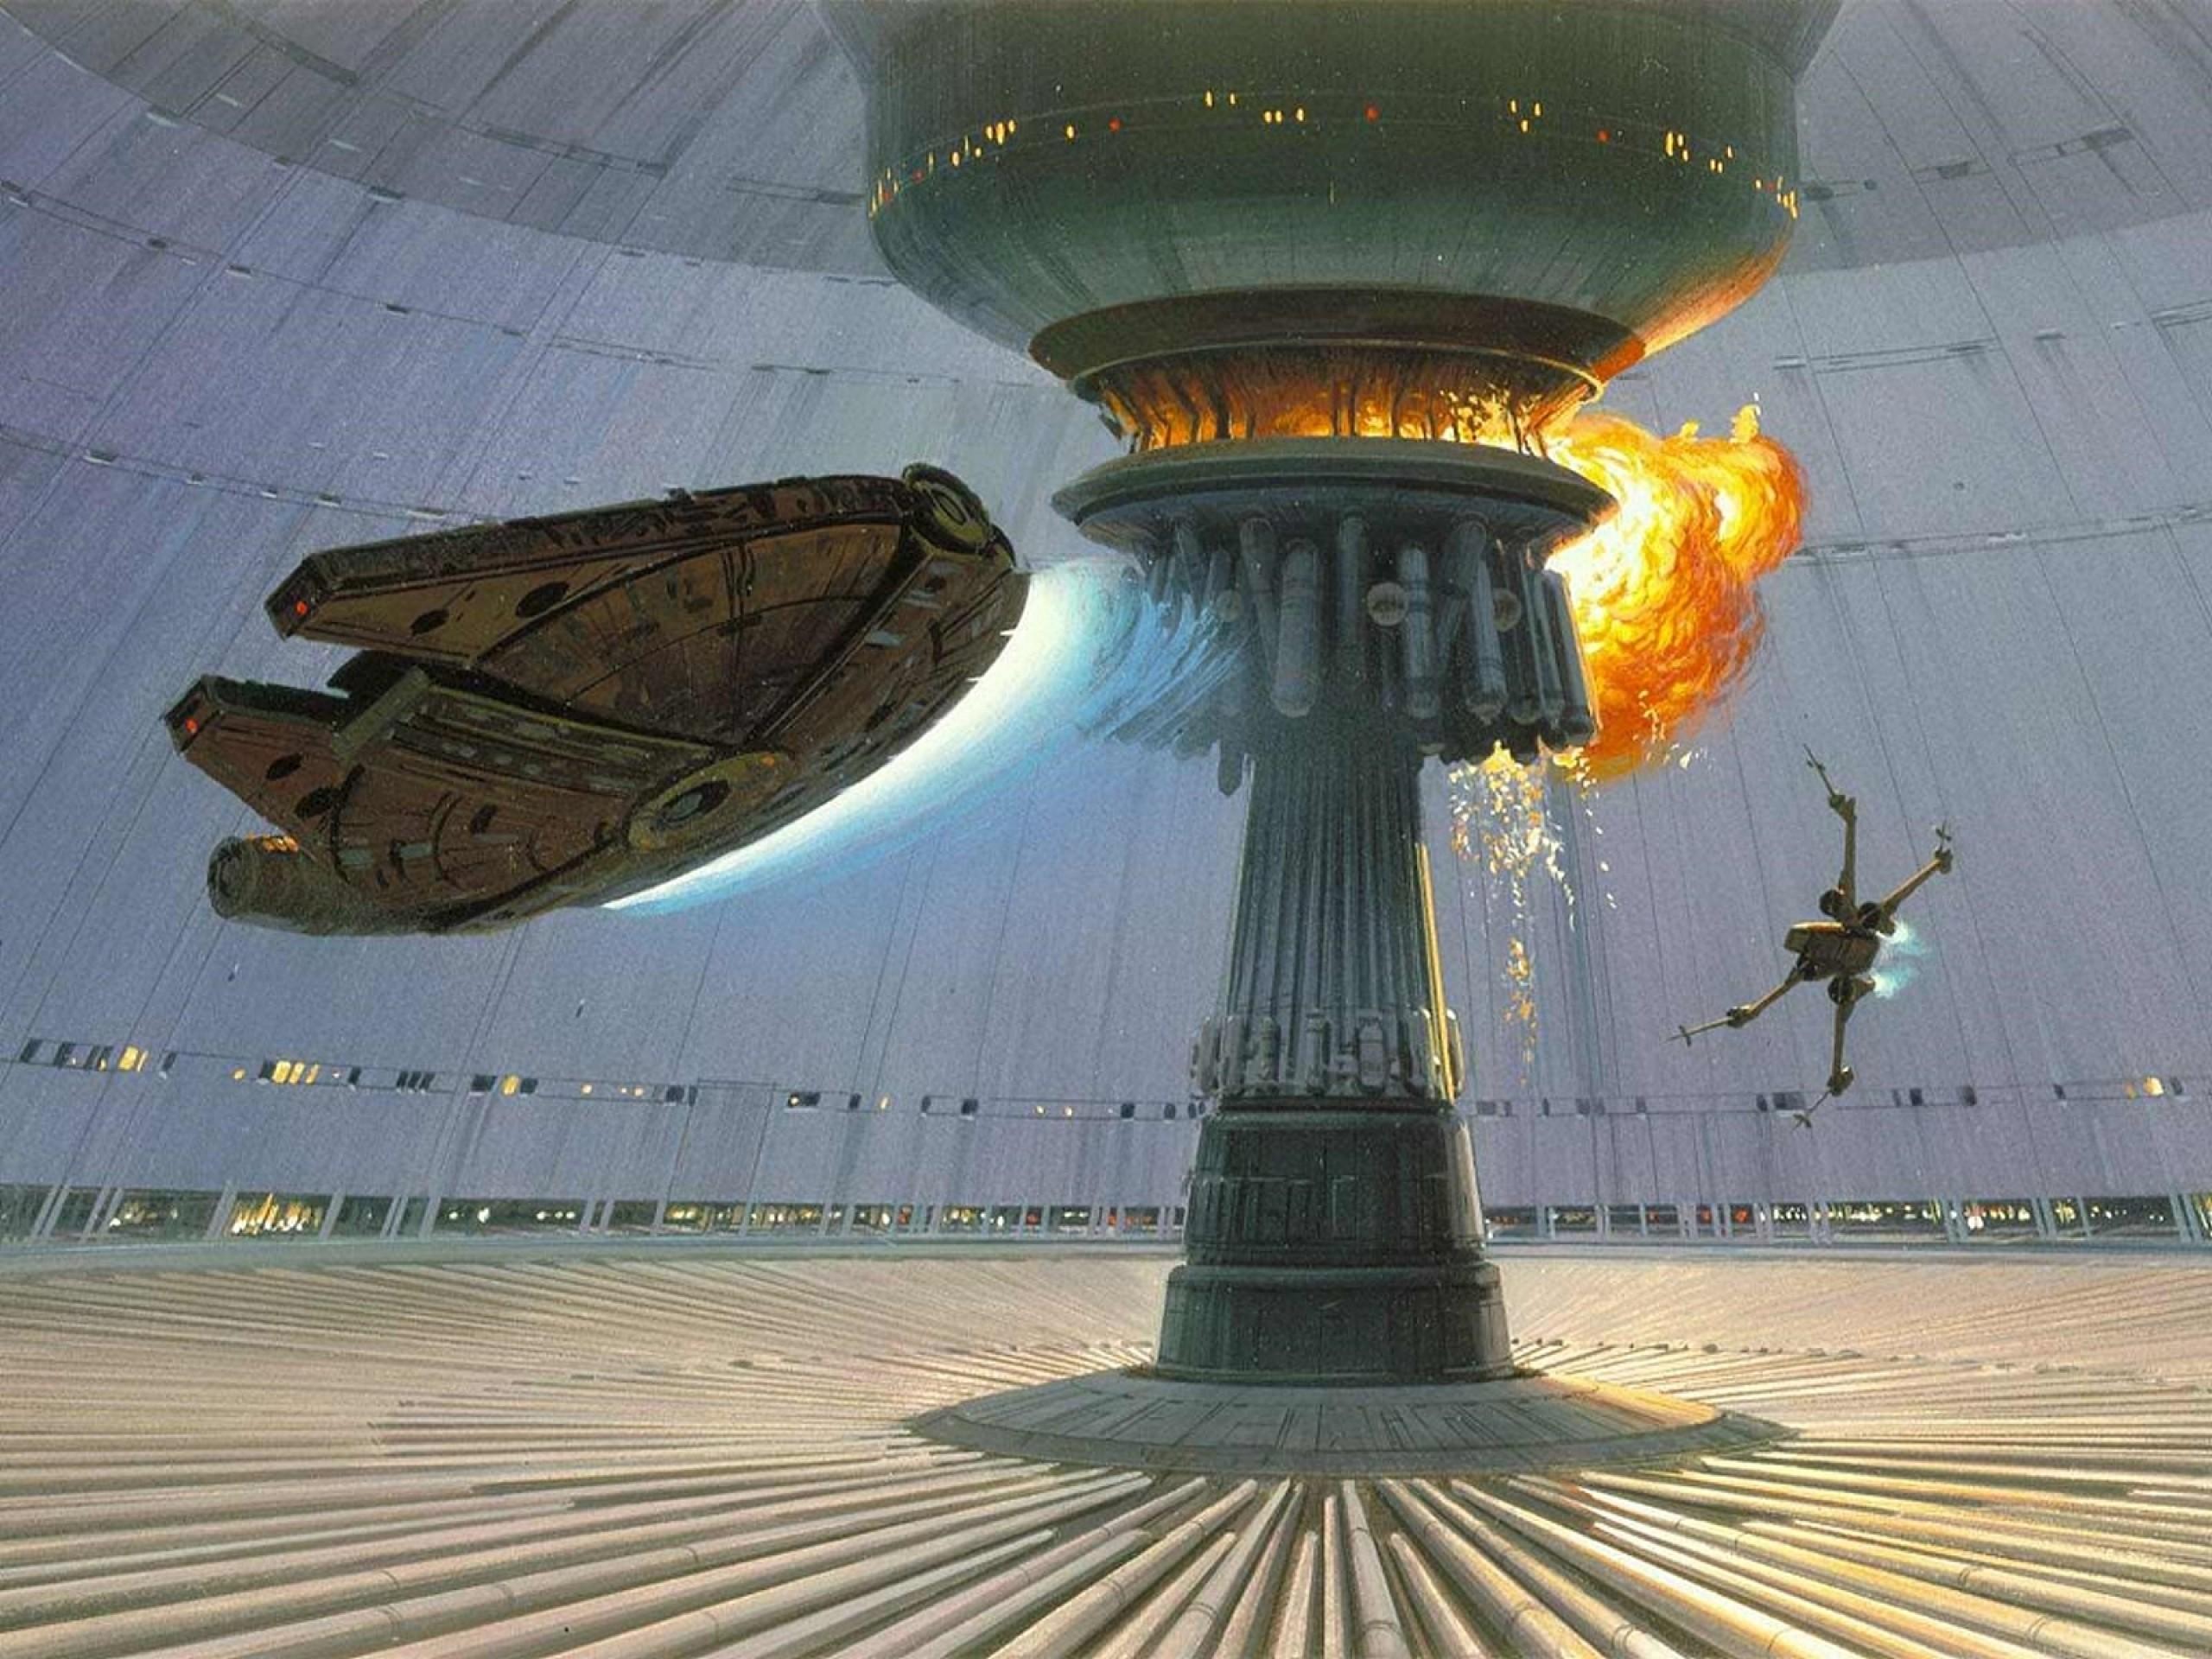 star wars explosions death star millenium falcon xwing concept art ralph  mcquarrie 1600×1200 wal Art HD